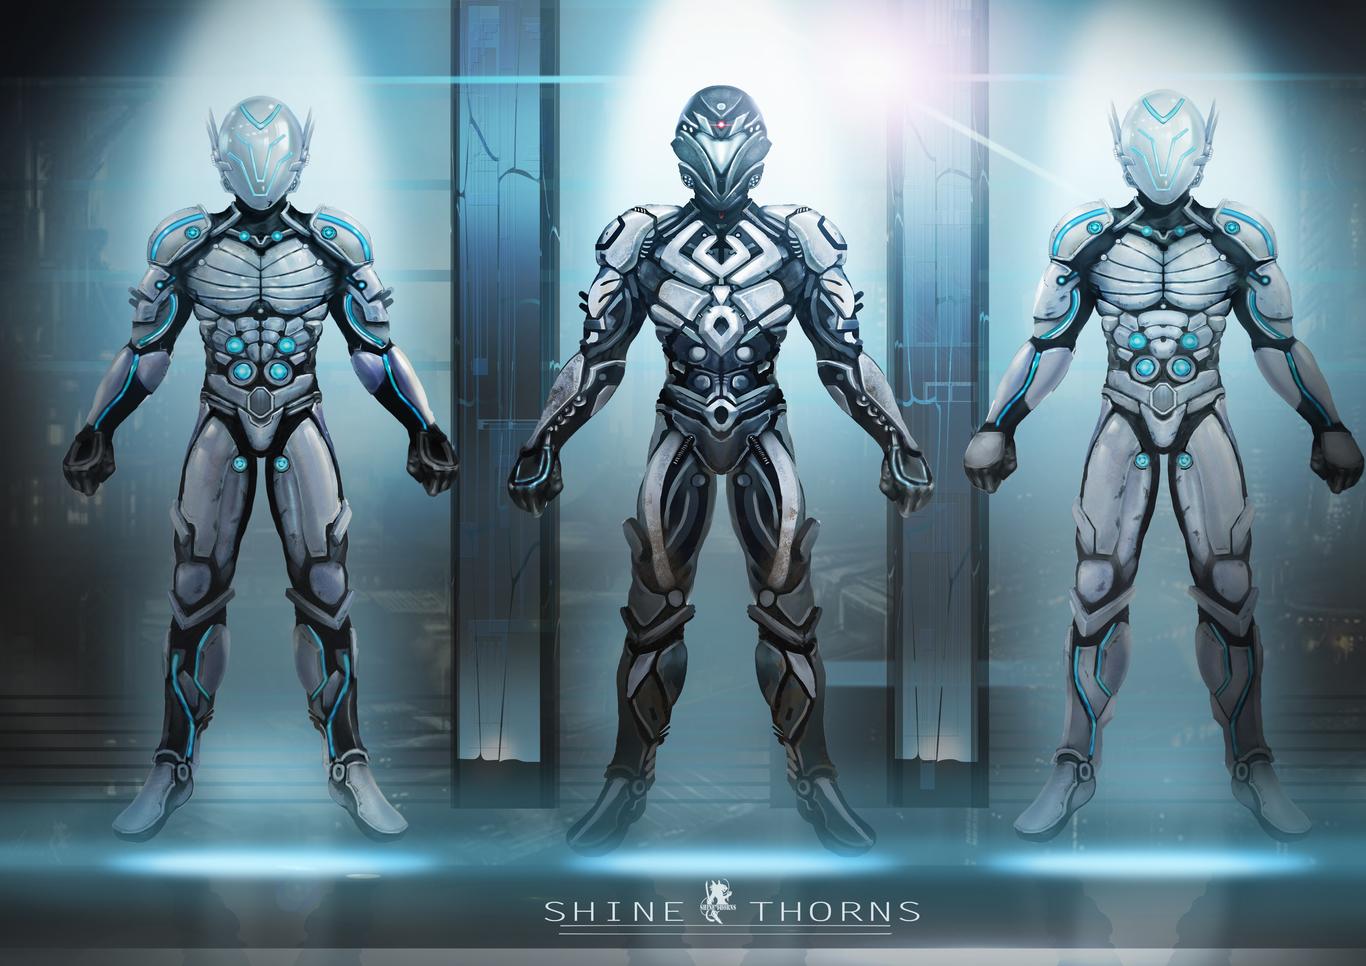 Shinethorns soldier 1 f573f110 uioo